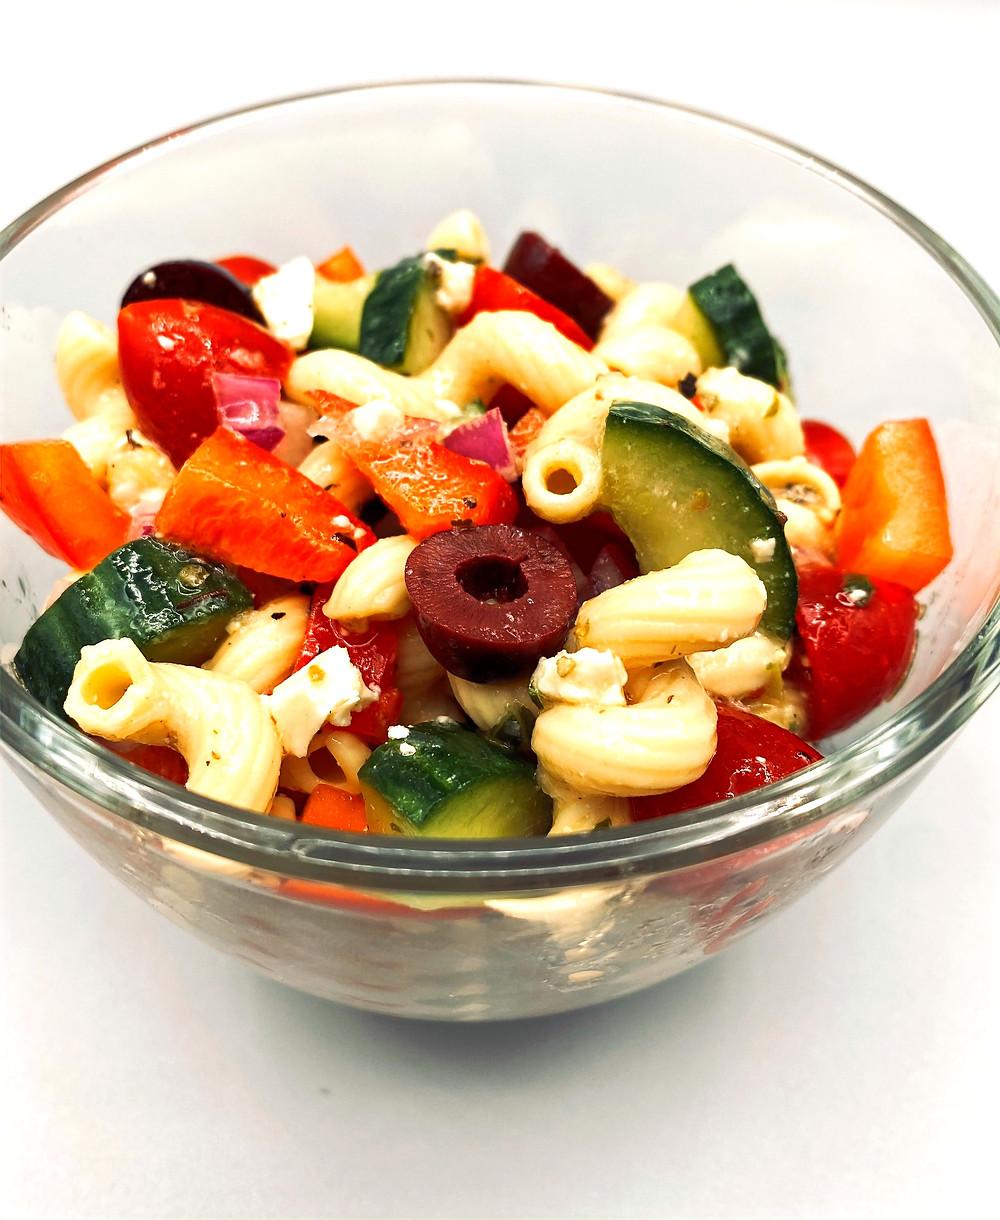 Mediterranean Pasta Salad recipe and photo by prettyhealthyplate.com